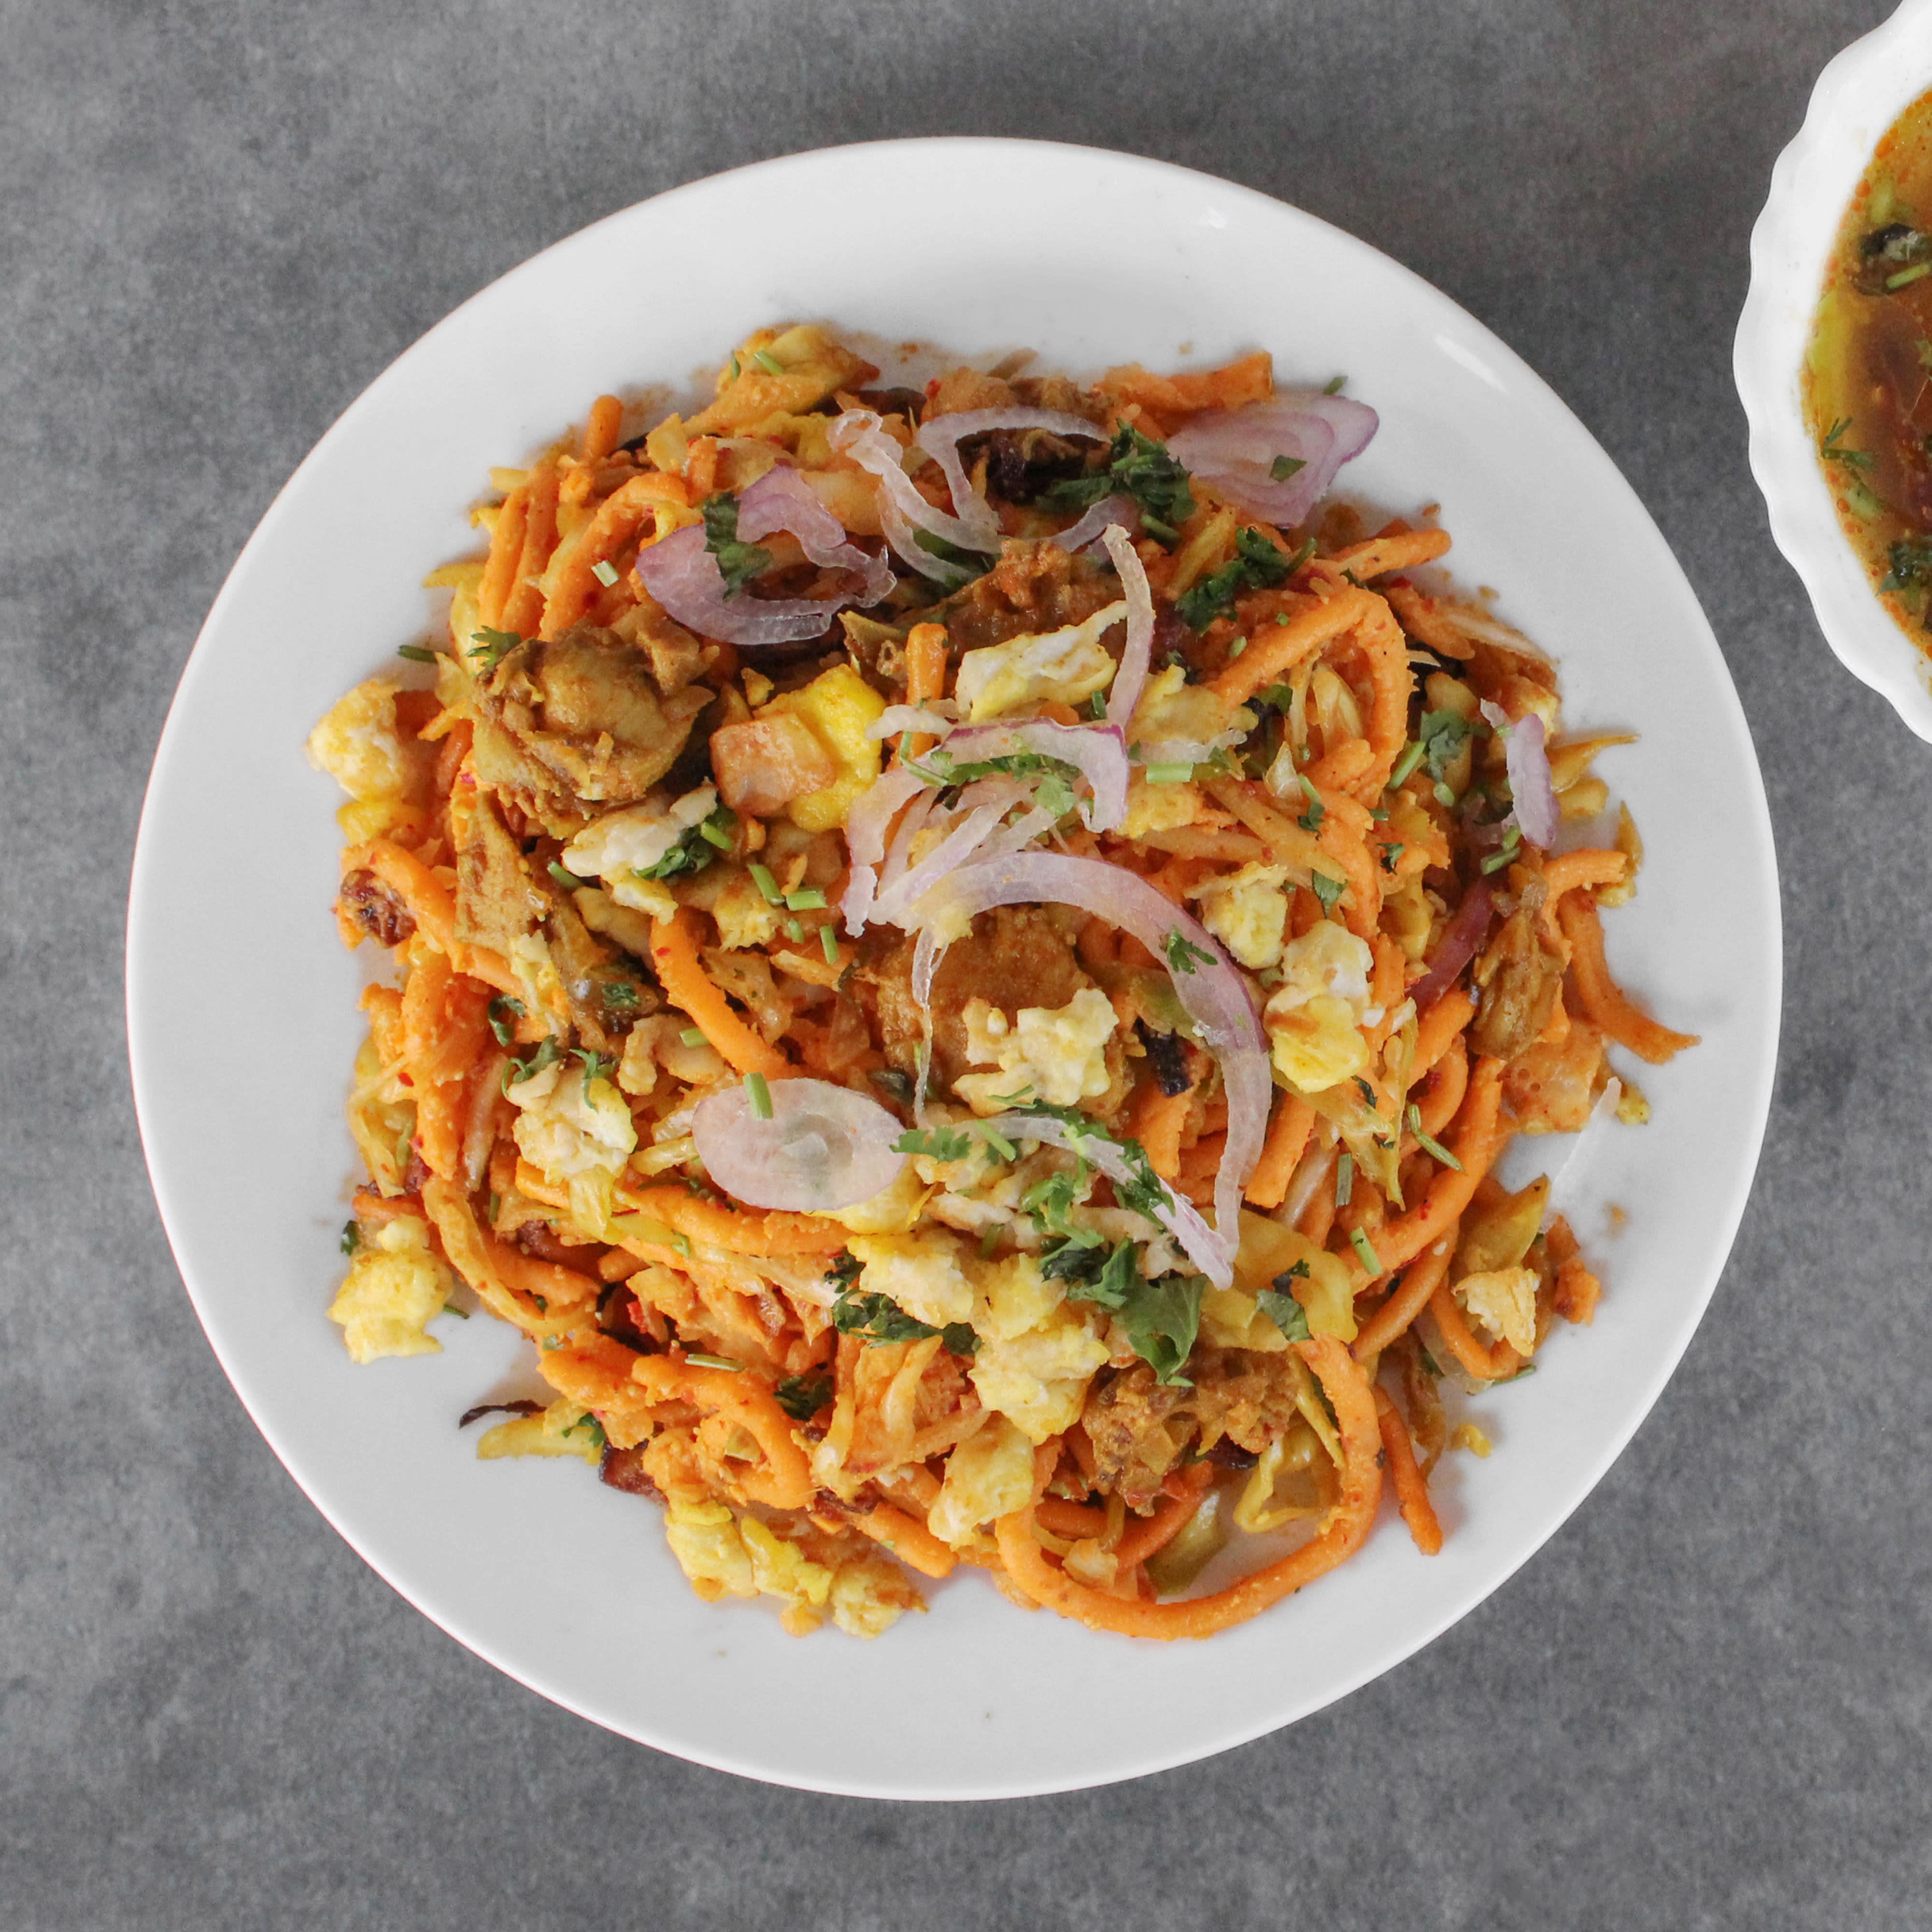 Atho S K Burma Foods | Home delivery | Order online